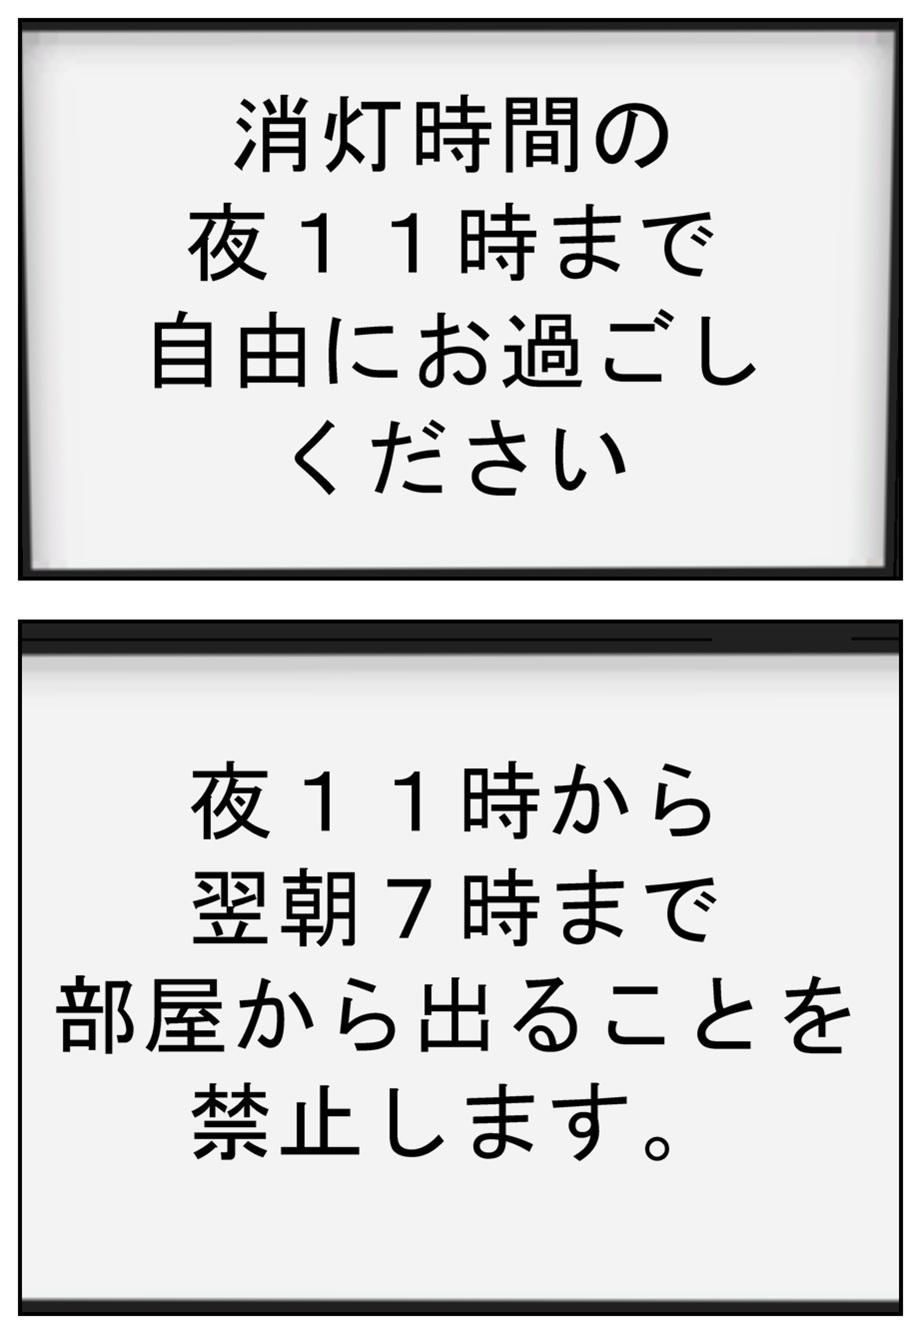 2016030502561642e.jpg